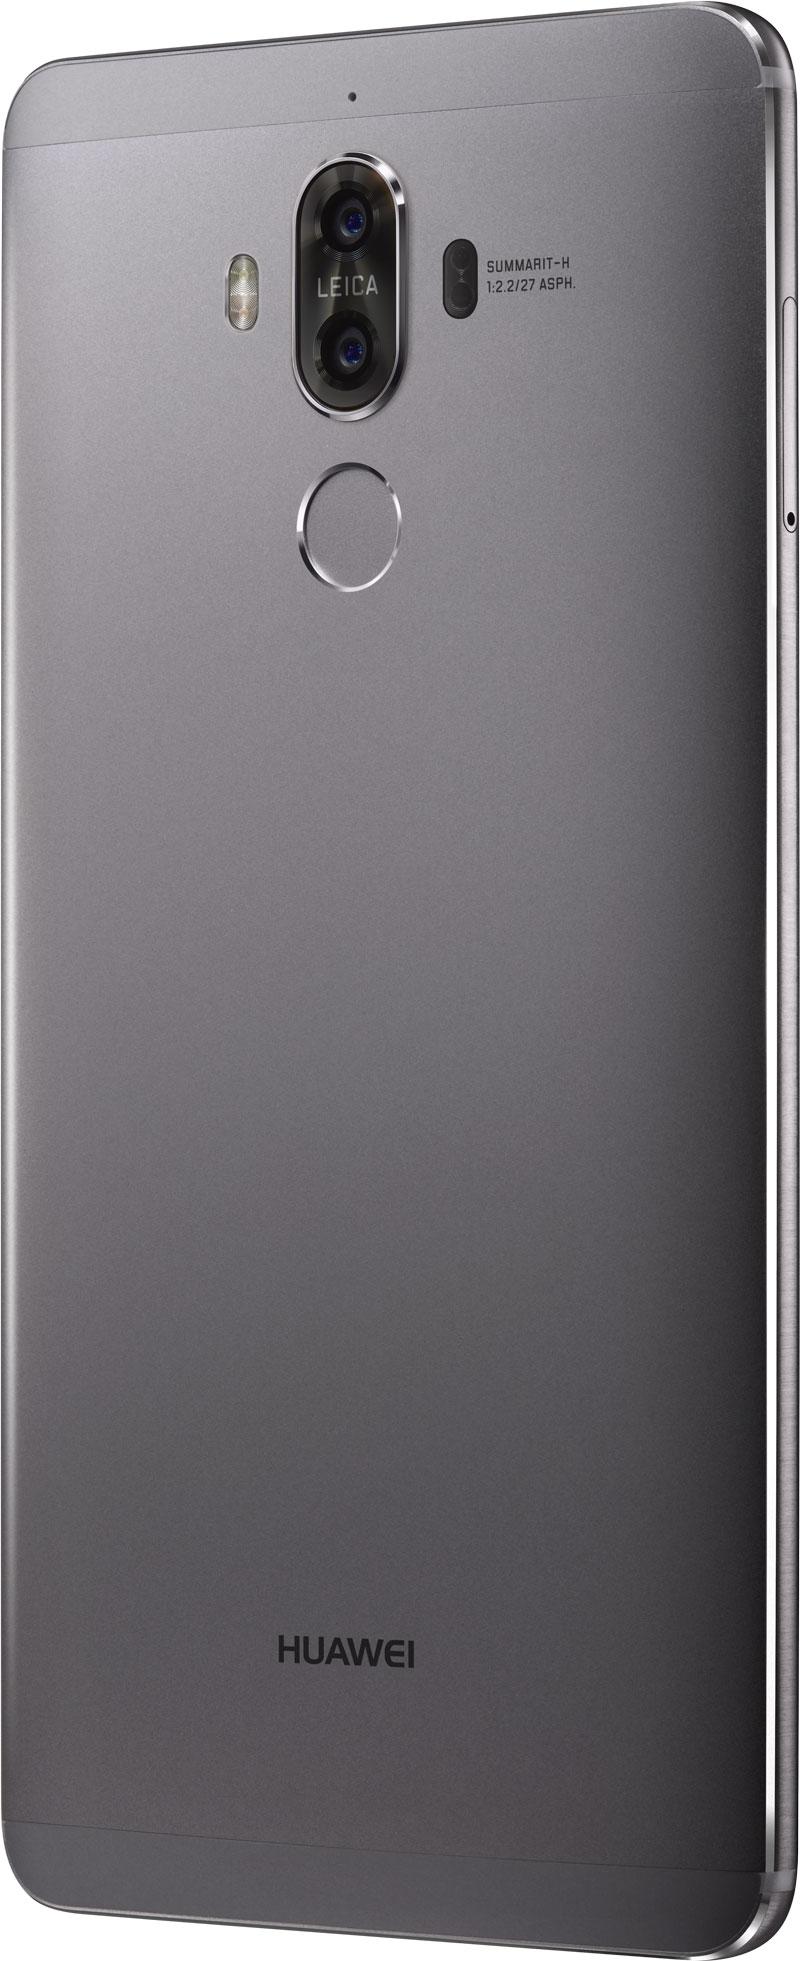 Le smartphone Huawei Mate 9.